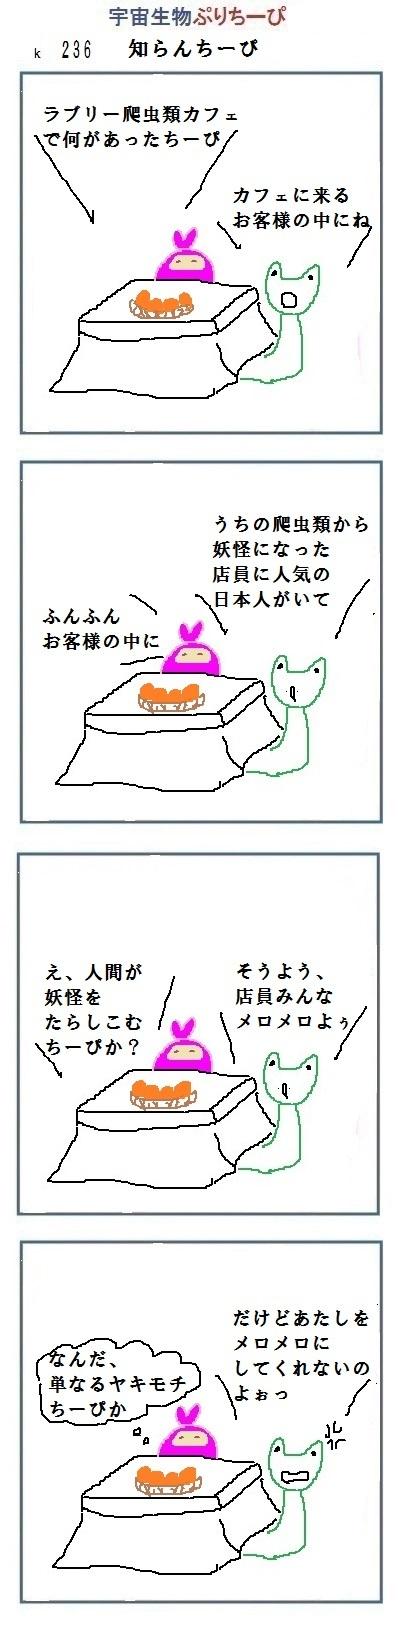 20170106100413c5f.jpg